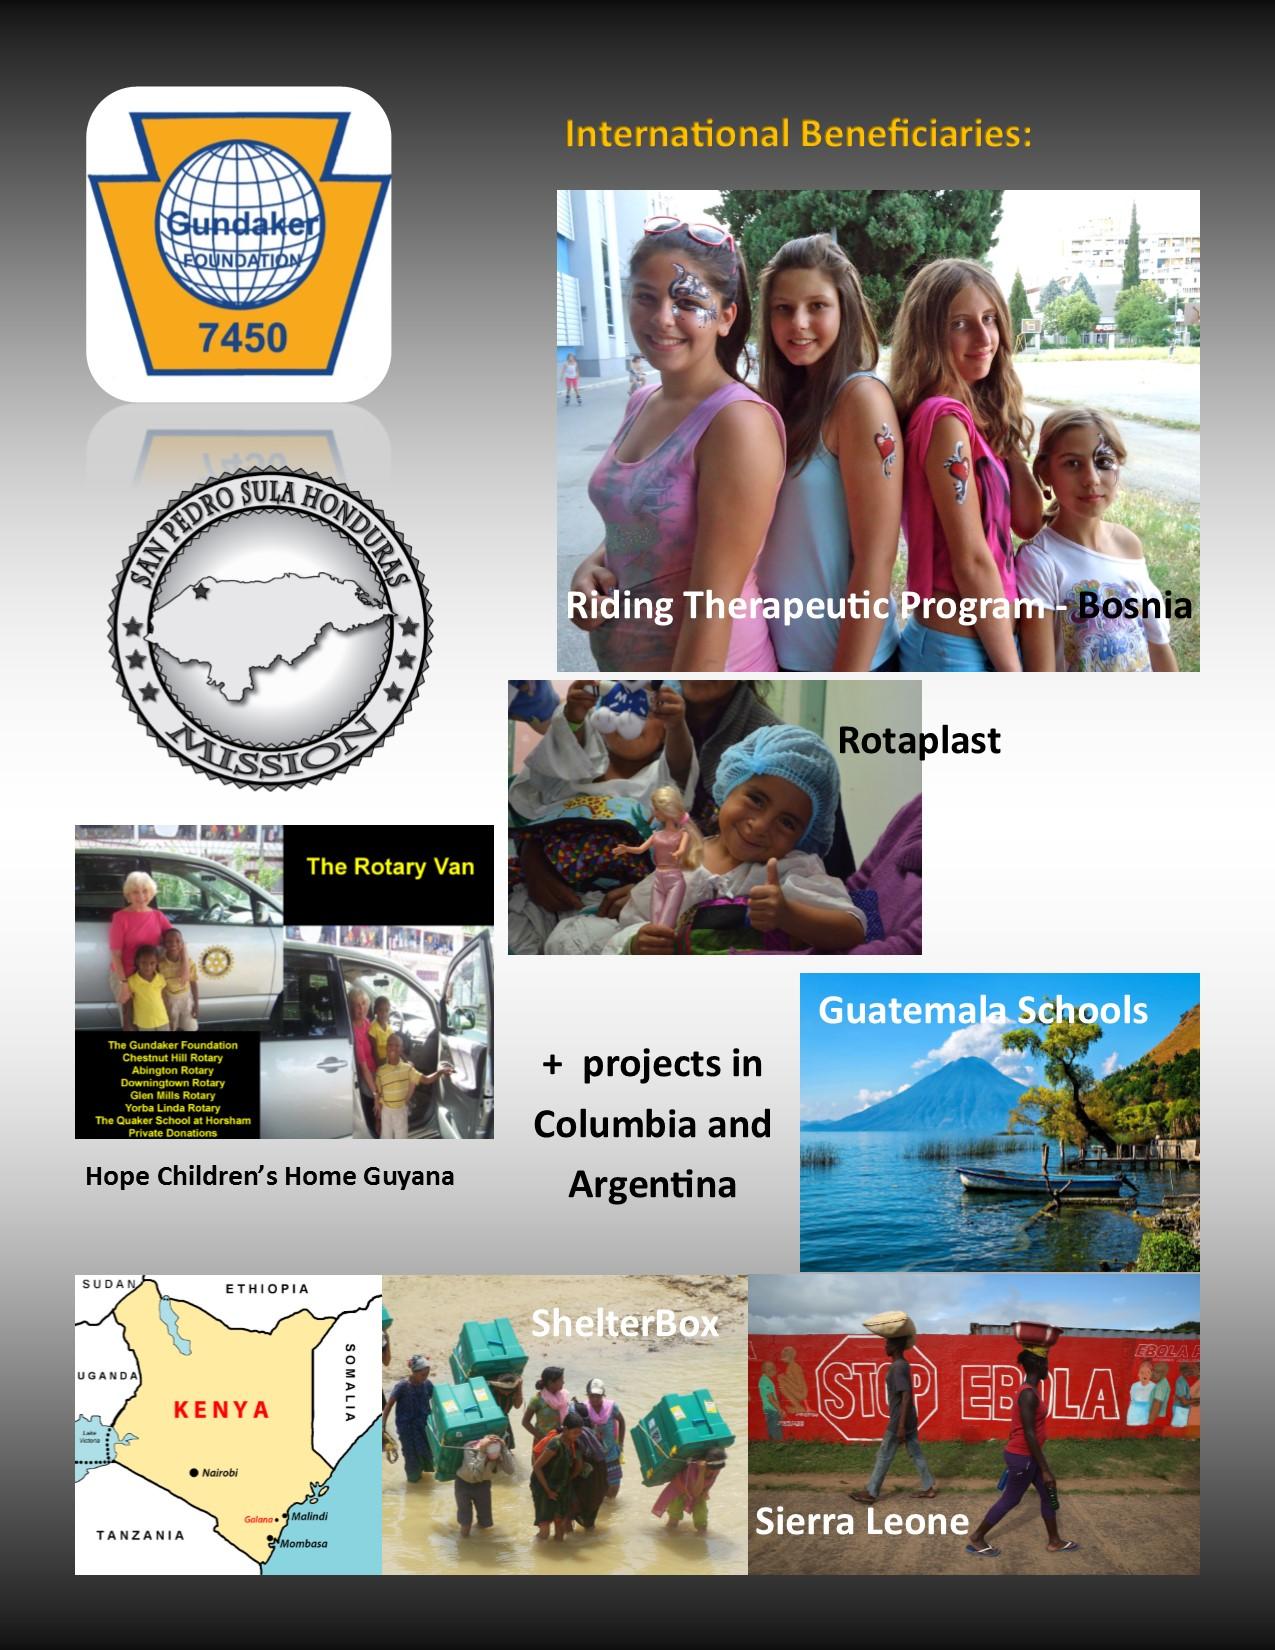 International Beneficiaries 2014 -2015